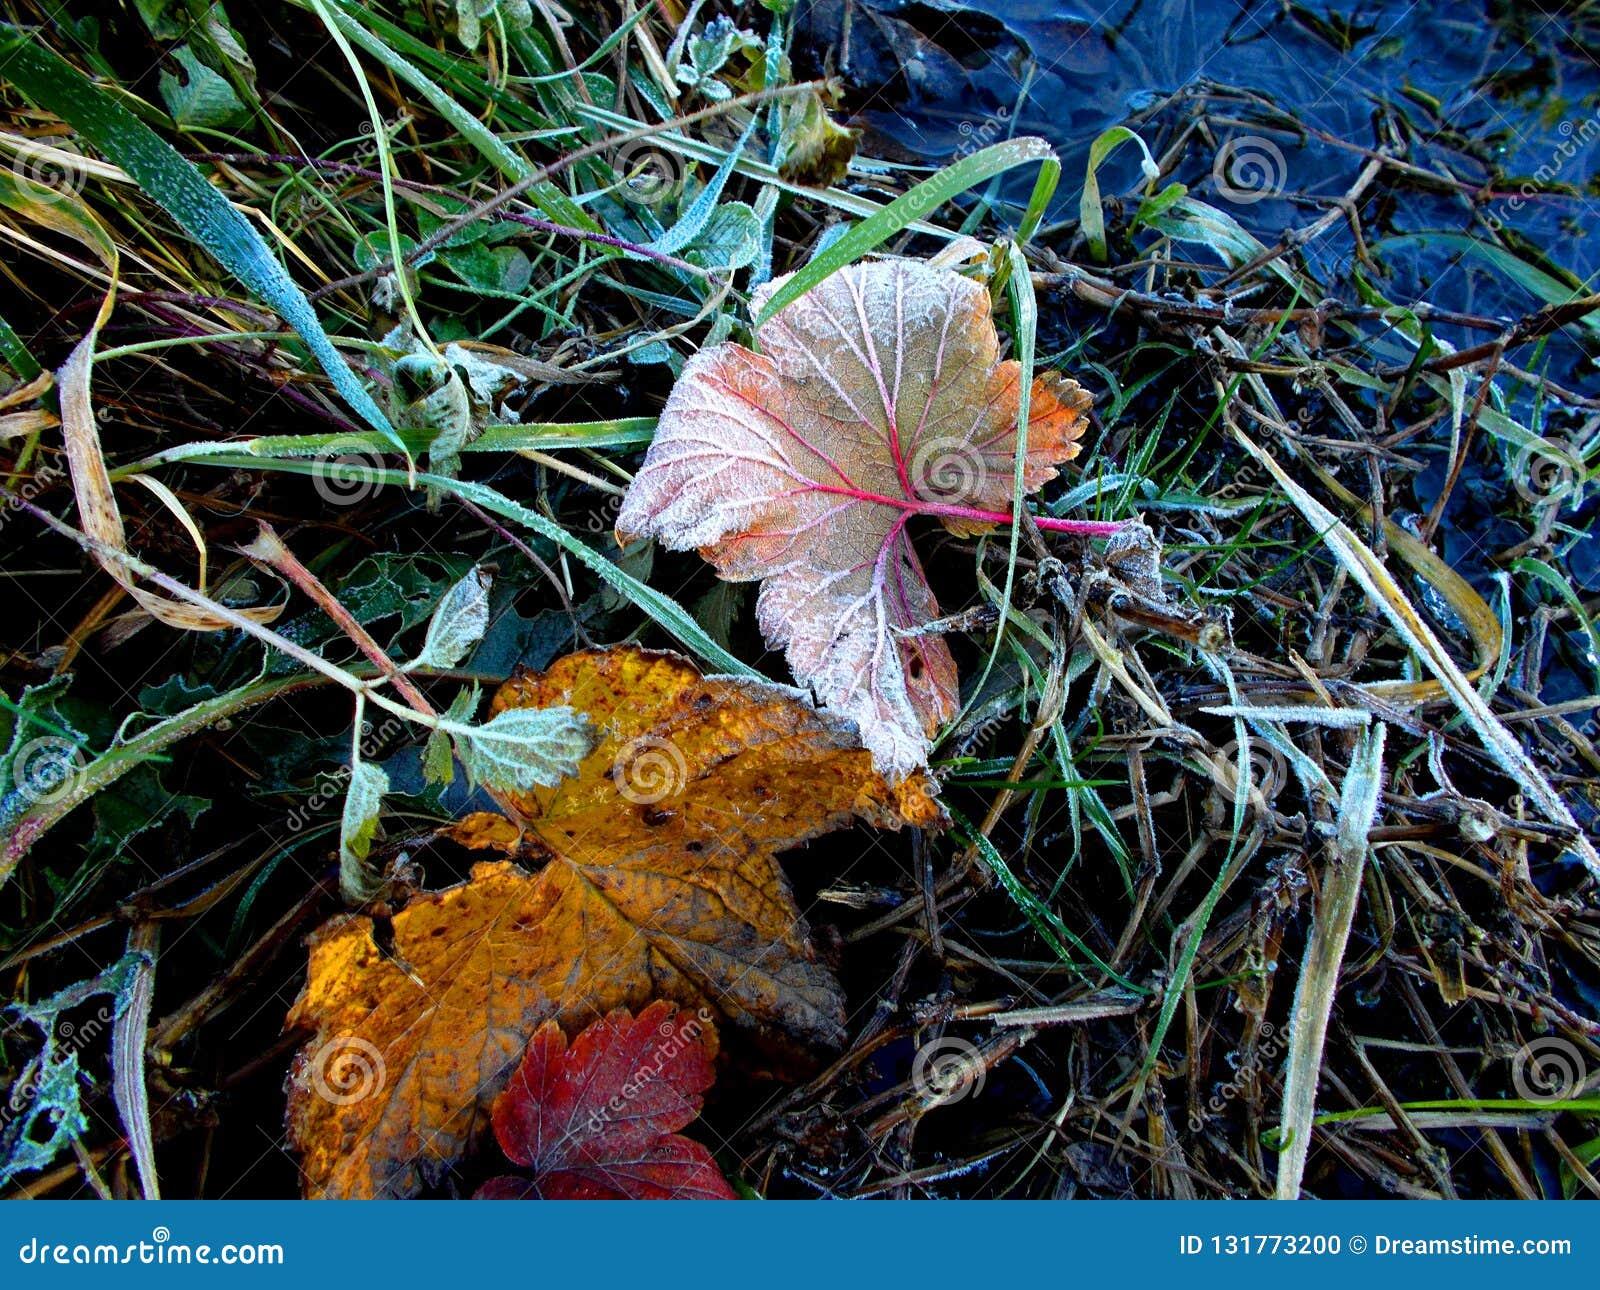 Leaves Of Grass Stream